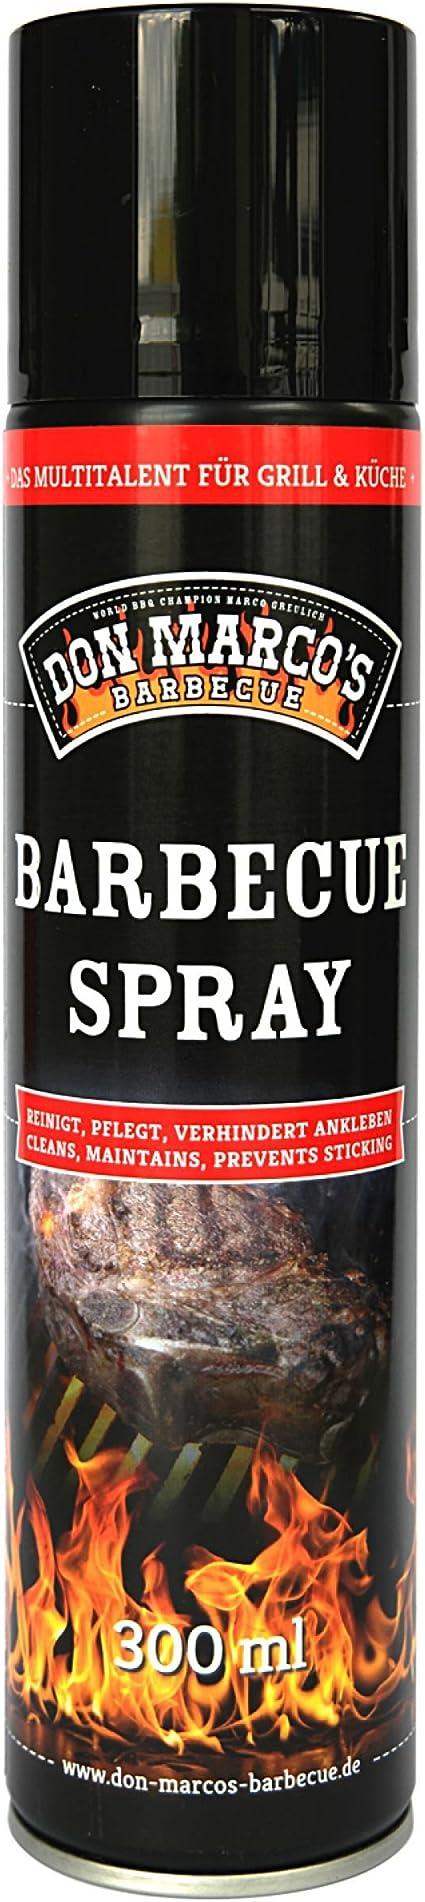 DON MARCO'S BARBECUE KS0425 Don Marco ✮s Barbecue Spray 3